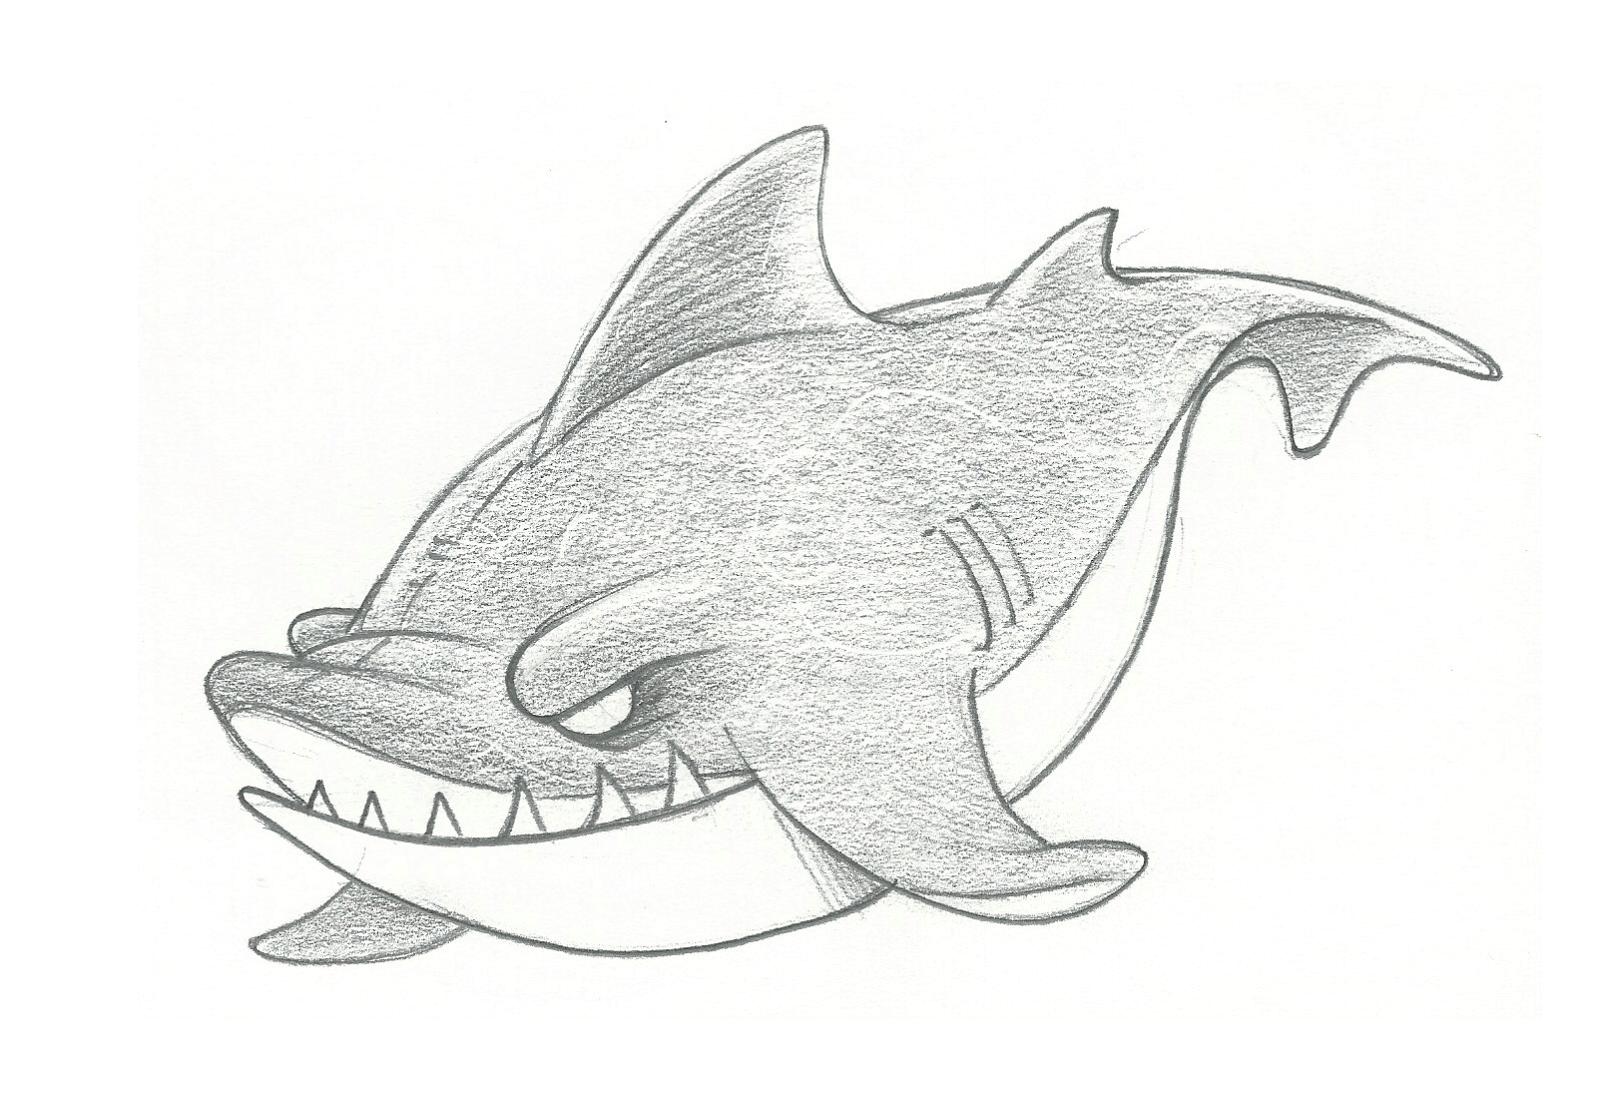 Cool Shark Drawing In Pencil Old Car Drawings Sketch